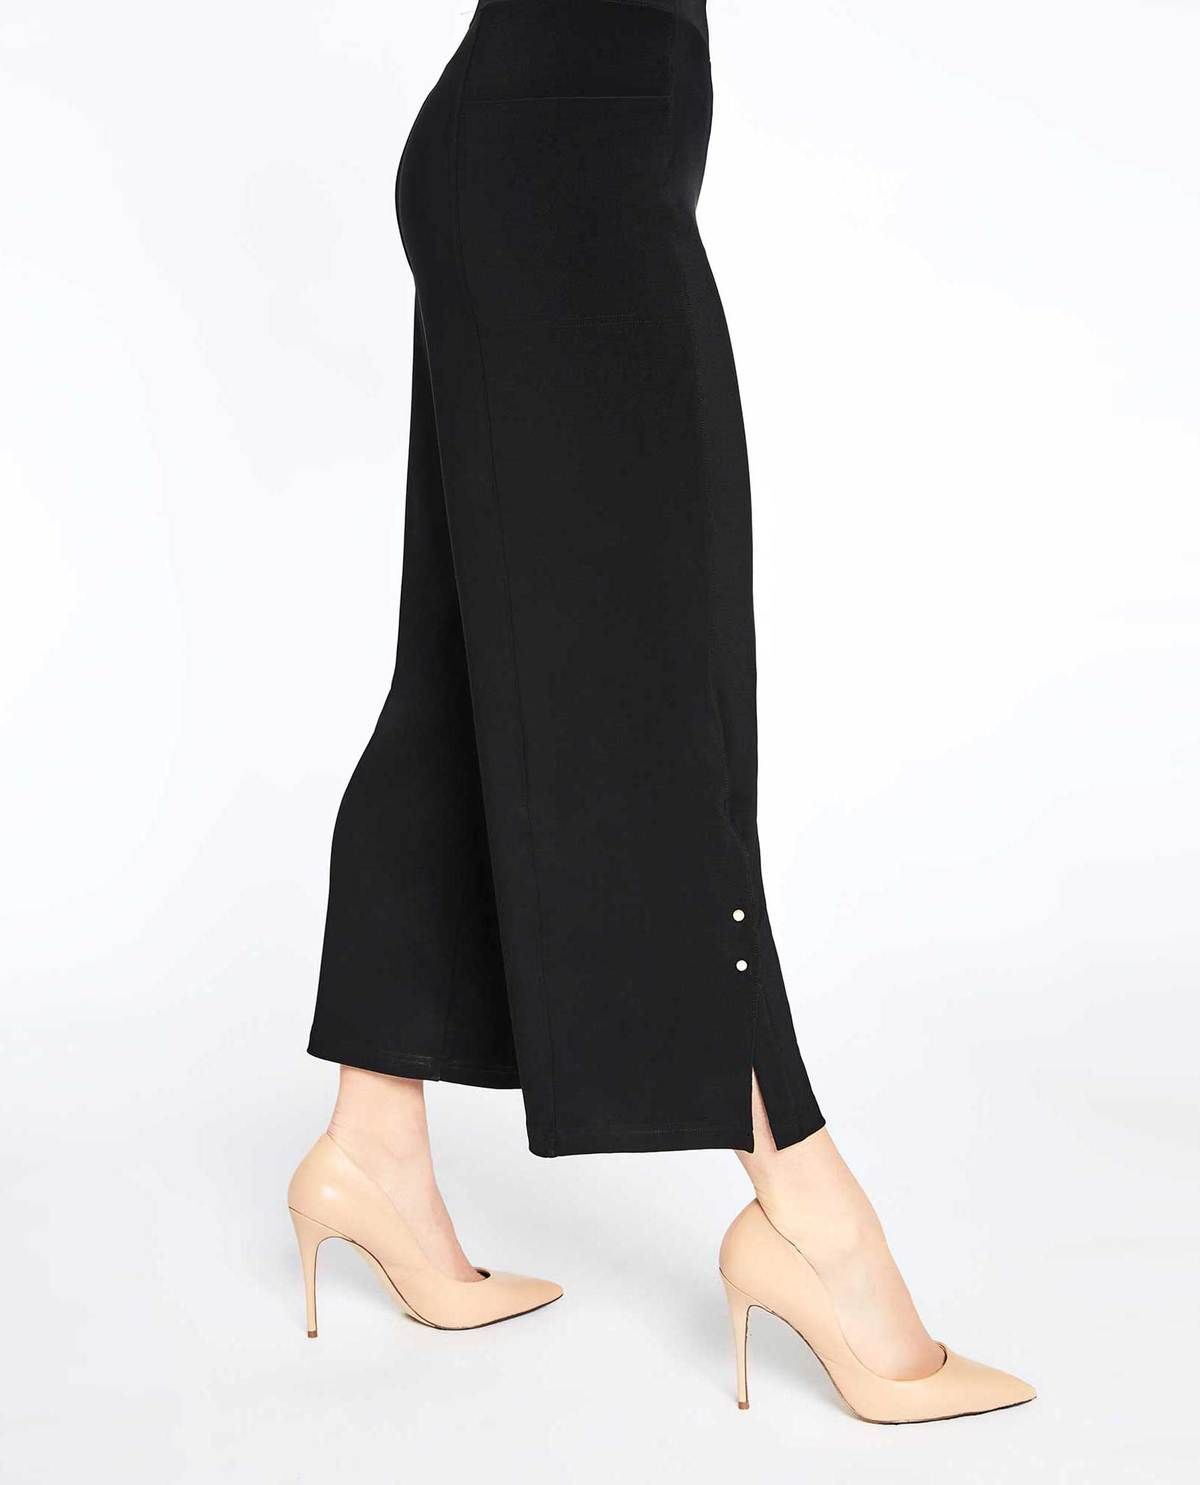 c24b836d62 Black wide leg pants with buttons #sympli #theclothingcove #blackpants  #widelegpants #womensfashion